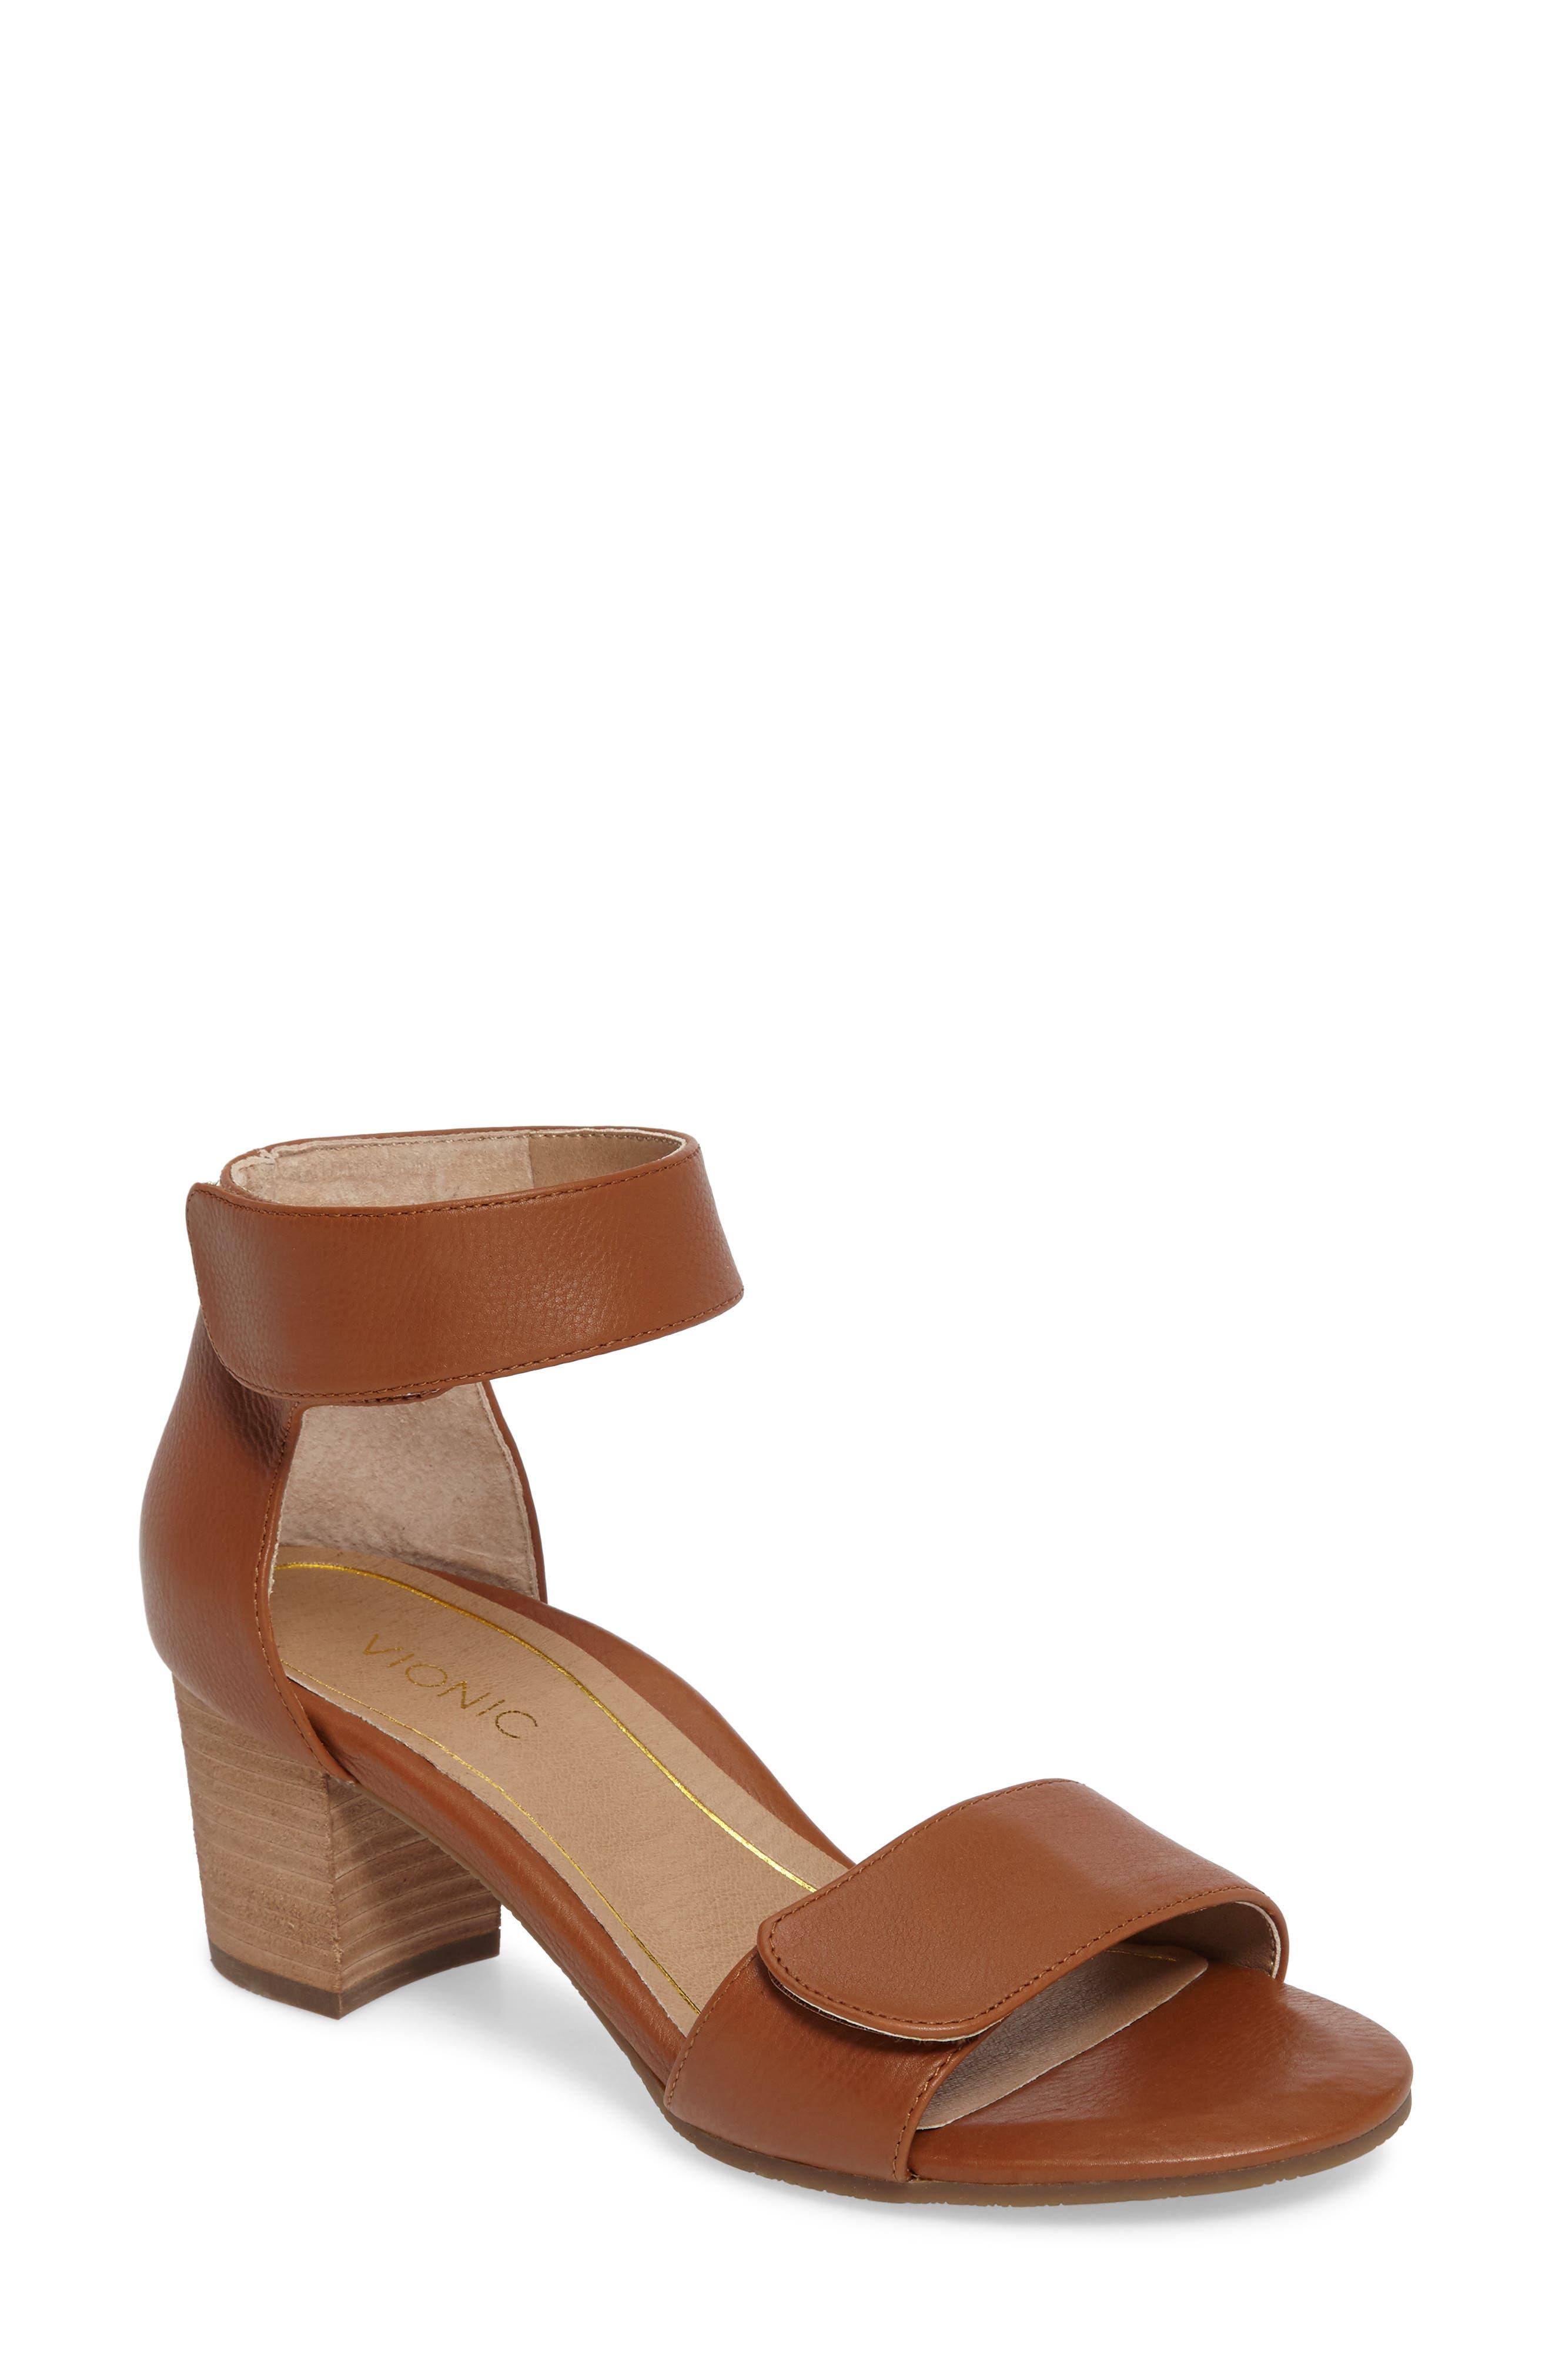 Vionic Solana with Orthaheel® Technology Sandal (Women)